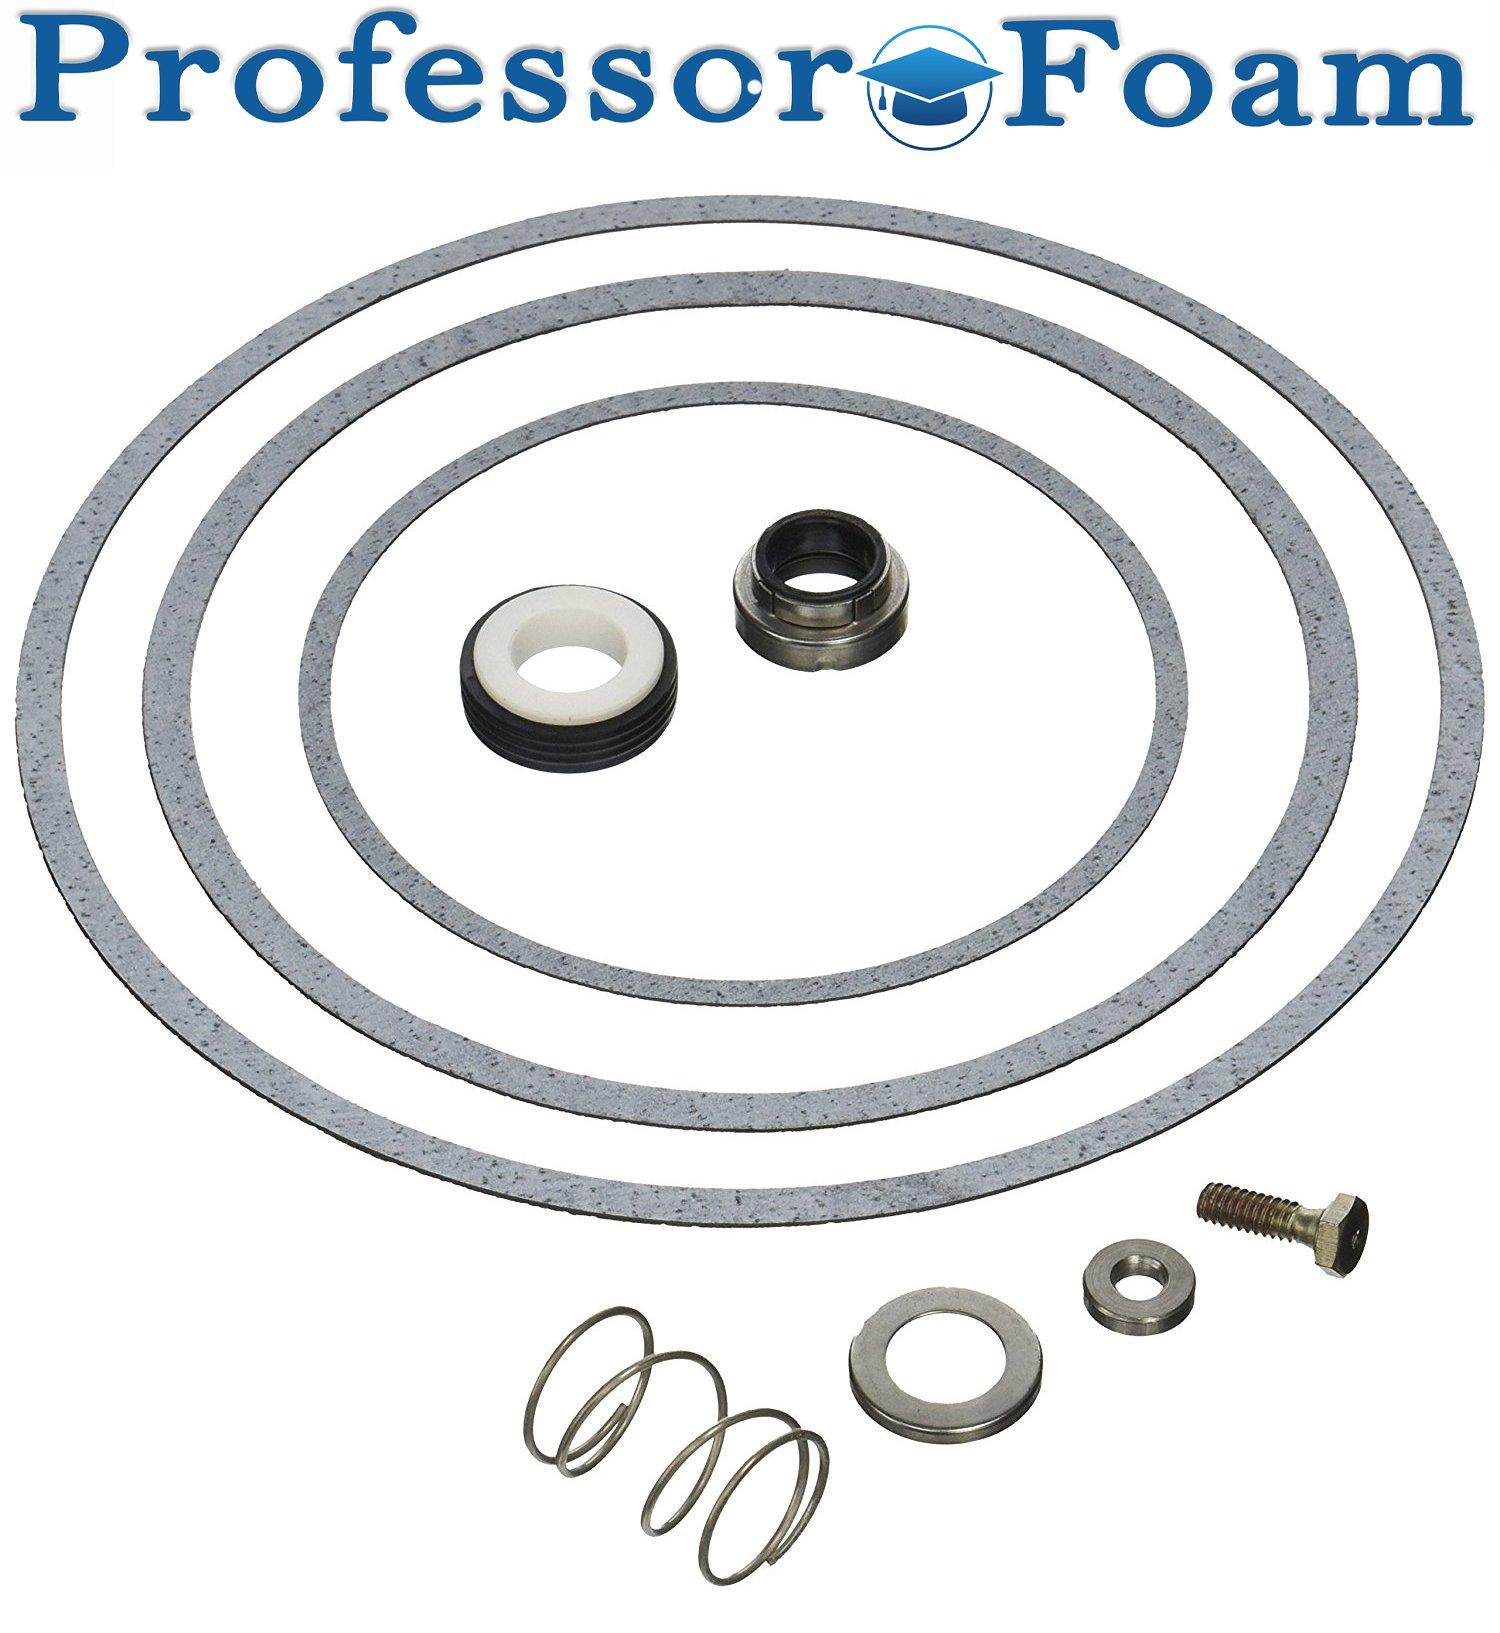 Professor Foam replacement kit for Taco 1600 Series 1600-868CRP (.625'') by Professor Foam